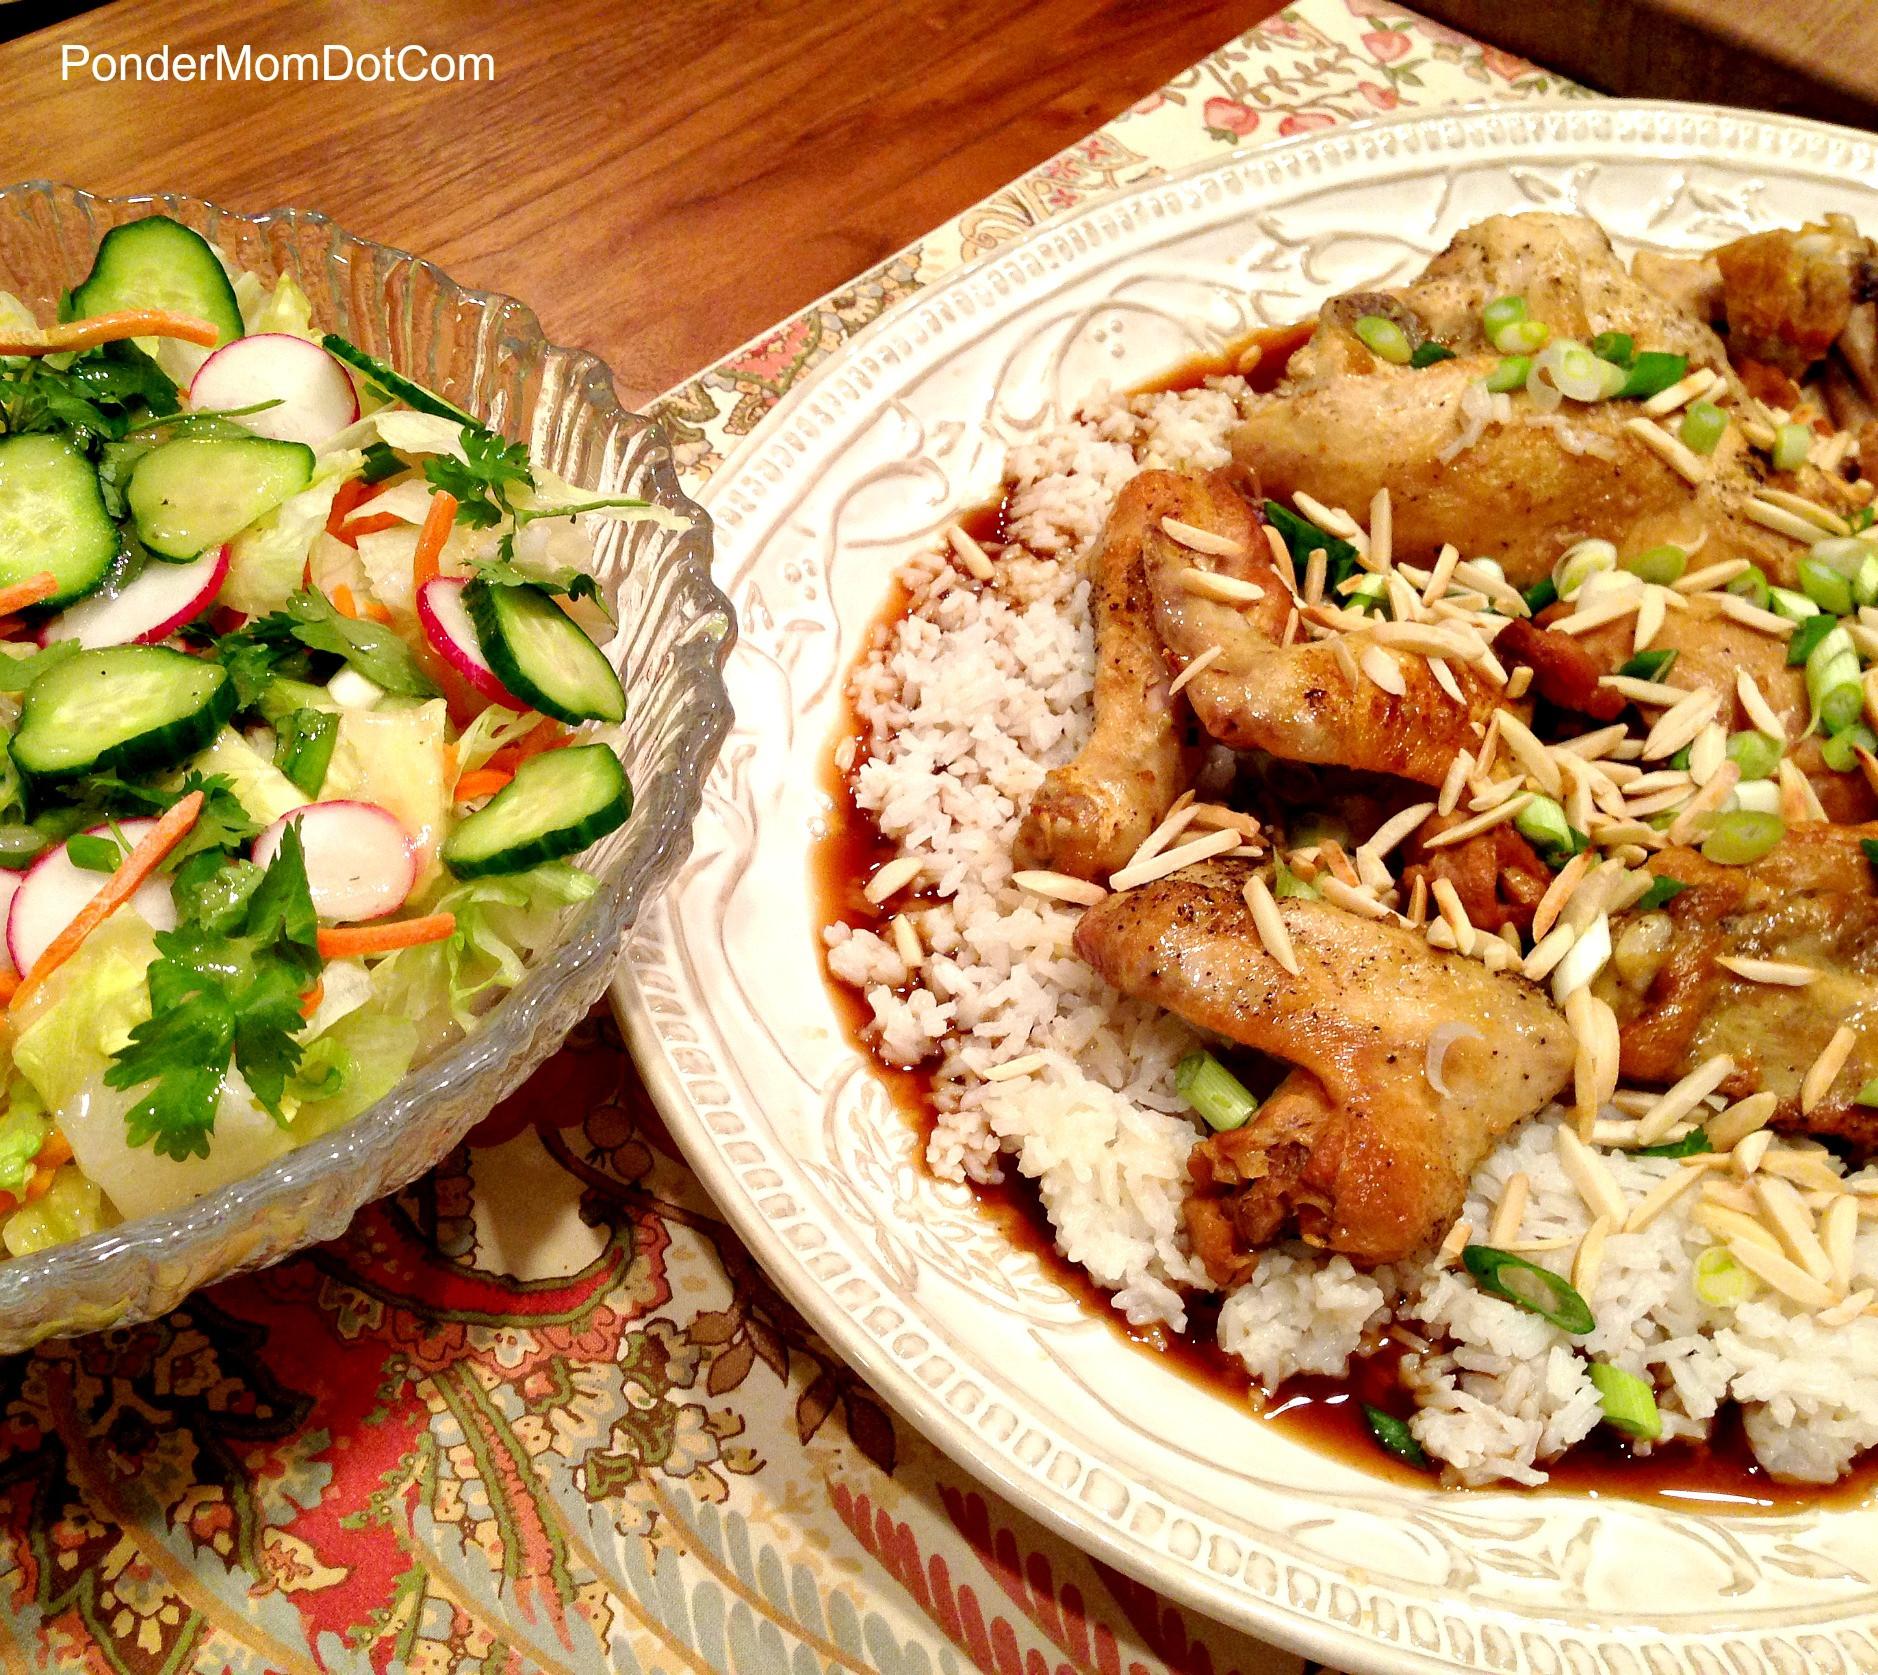 Healthy Chicken Crockpot Dinners  PonderMom Blog Archive Healthy Dinner 2 Asian